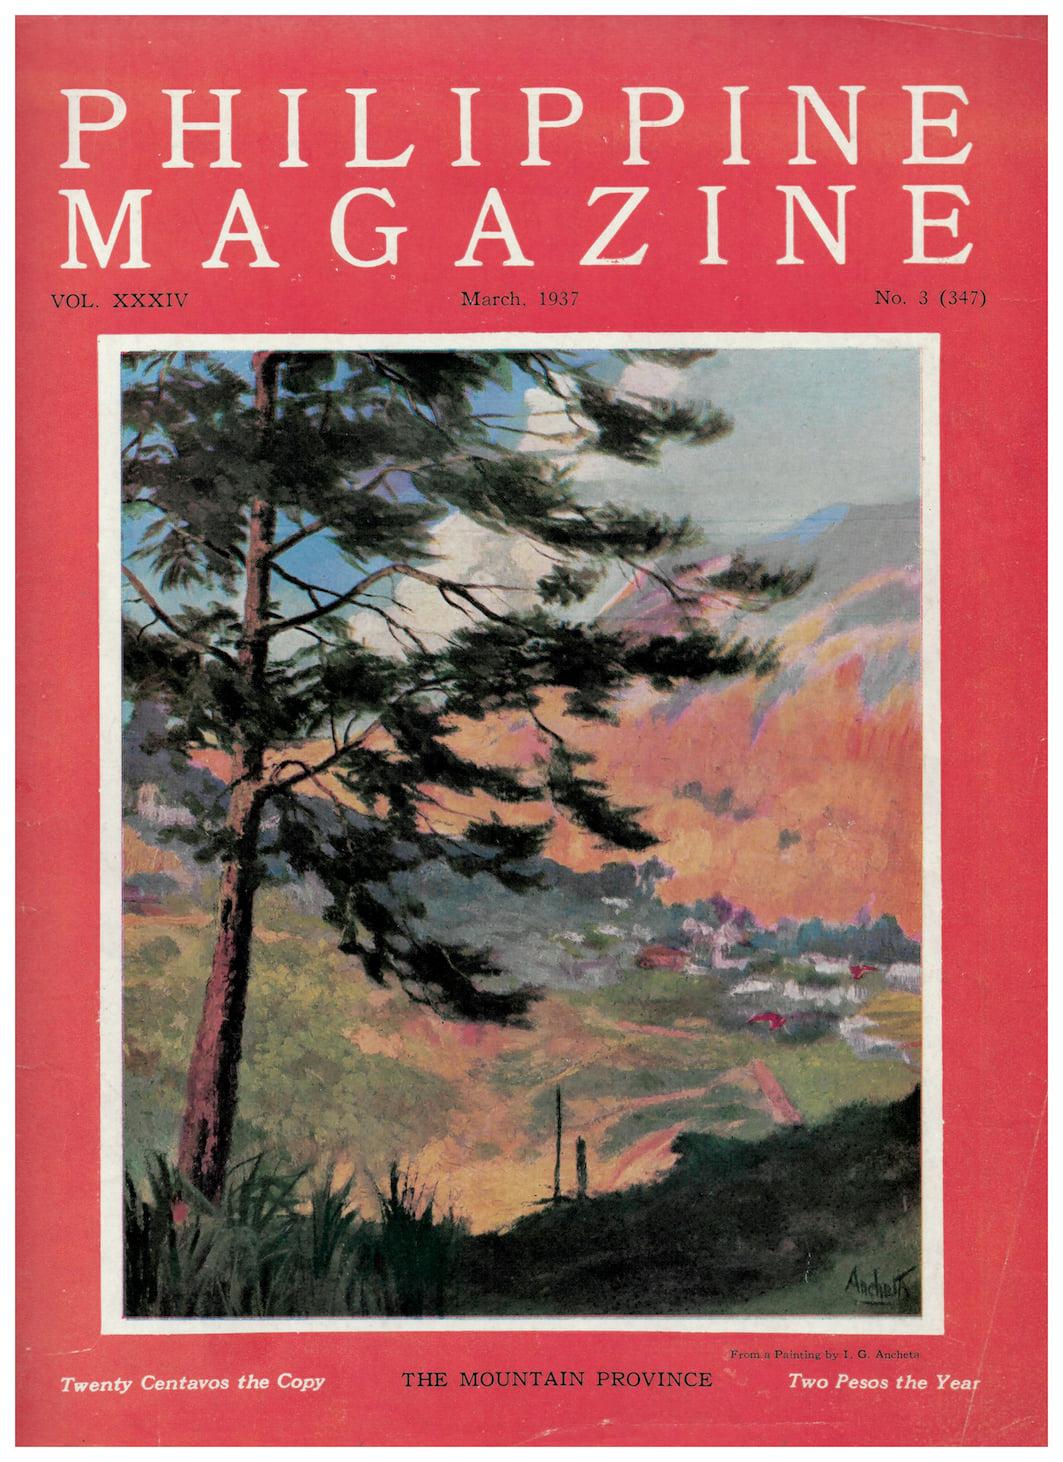 Nakita kita sa isang magasin: Philippine Magazine and how it created the Cordillera literary landscape